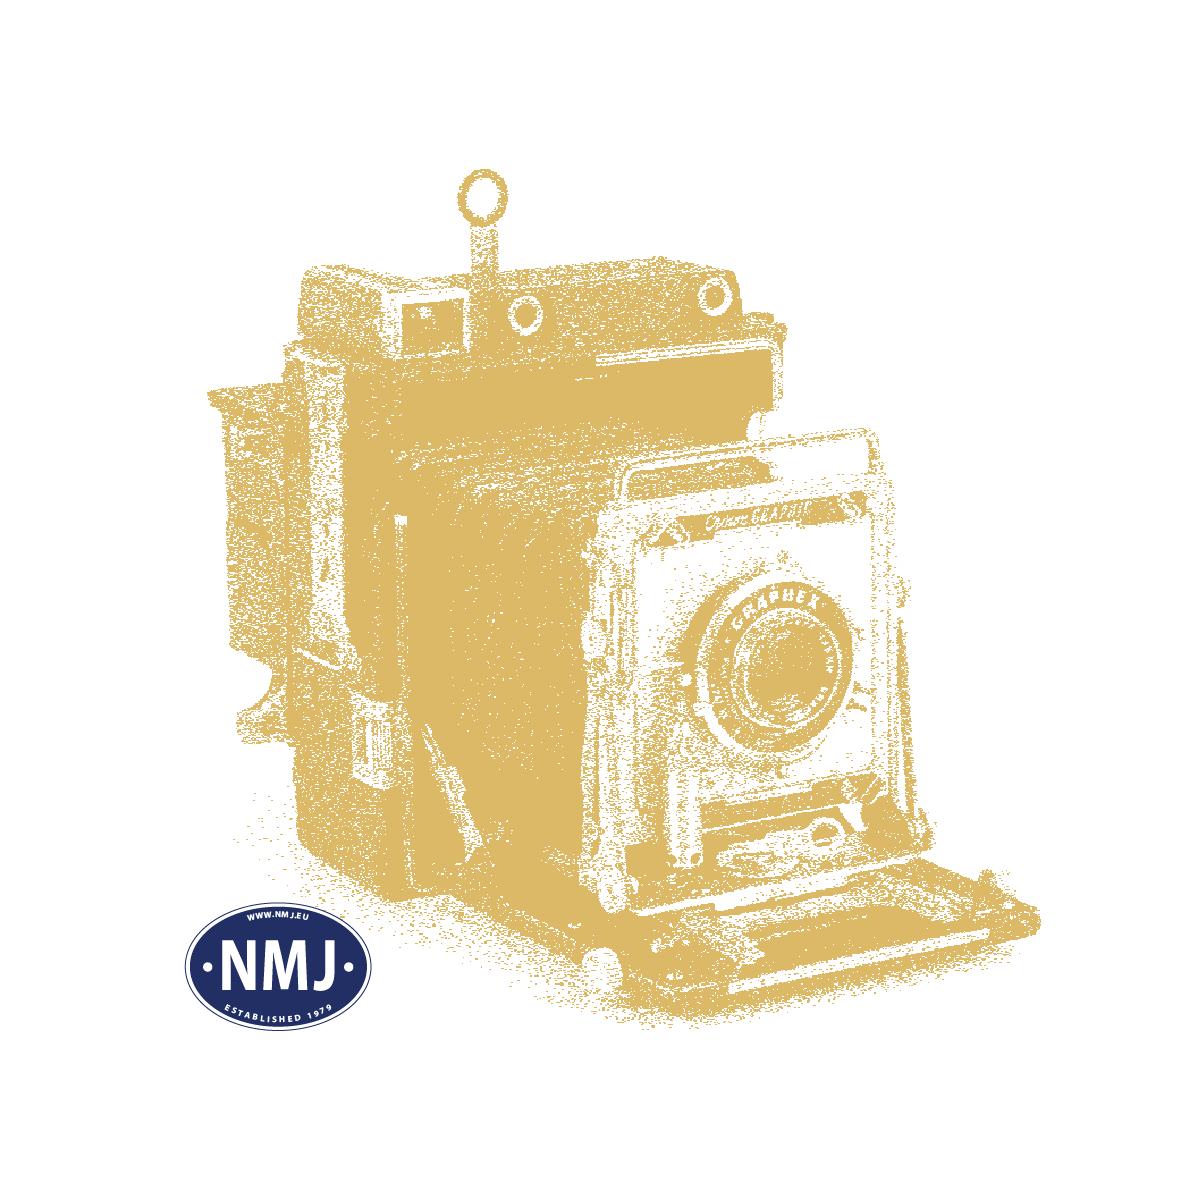 NMJ0G4-4 - NMJ Superline Modell des Gedeckten Güterwagens Gbkls 2076 158 5889-0  der NSB, Spur 0